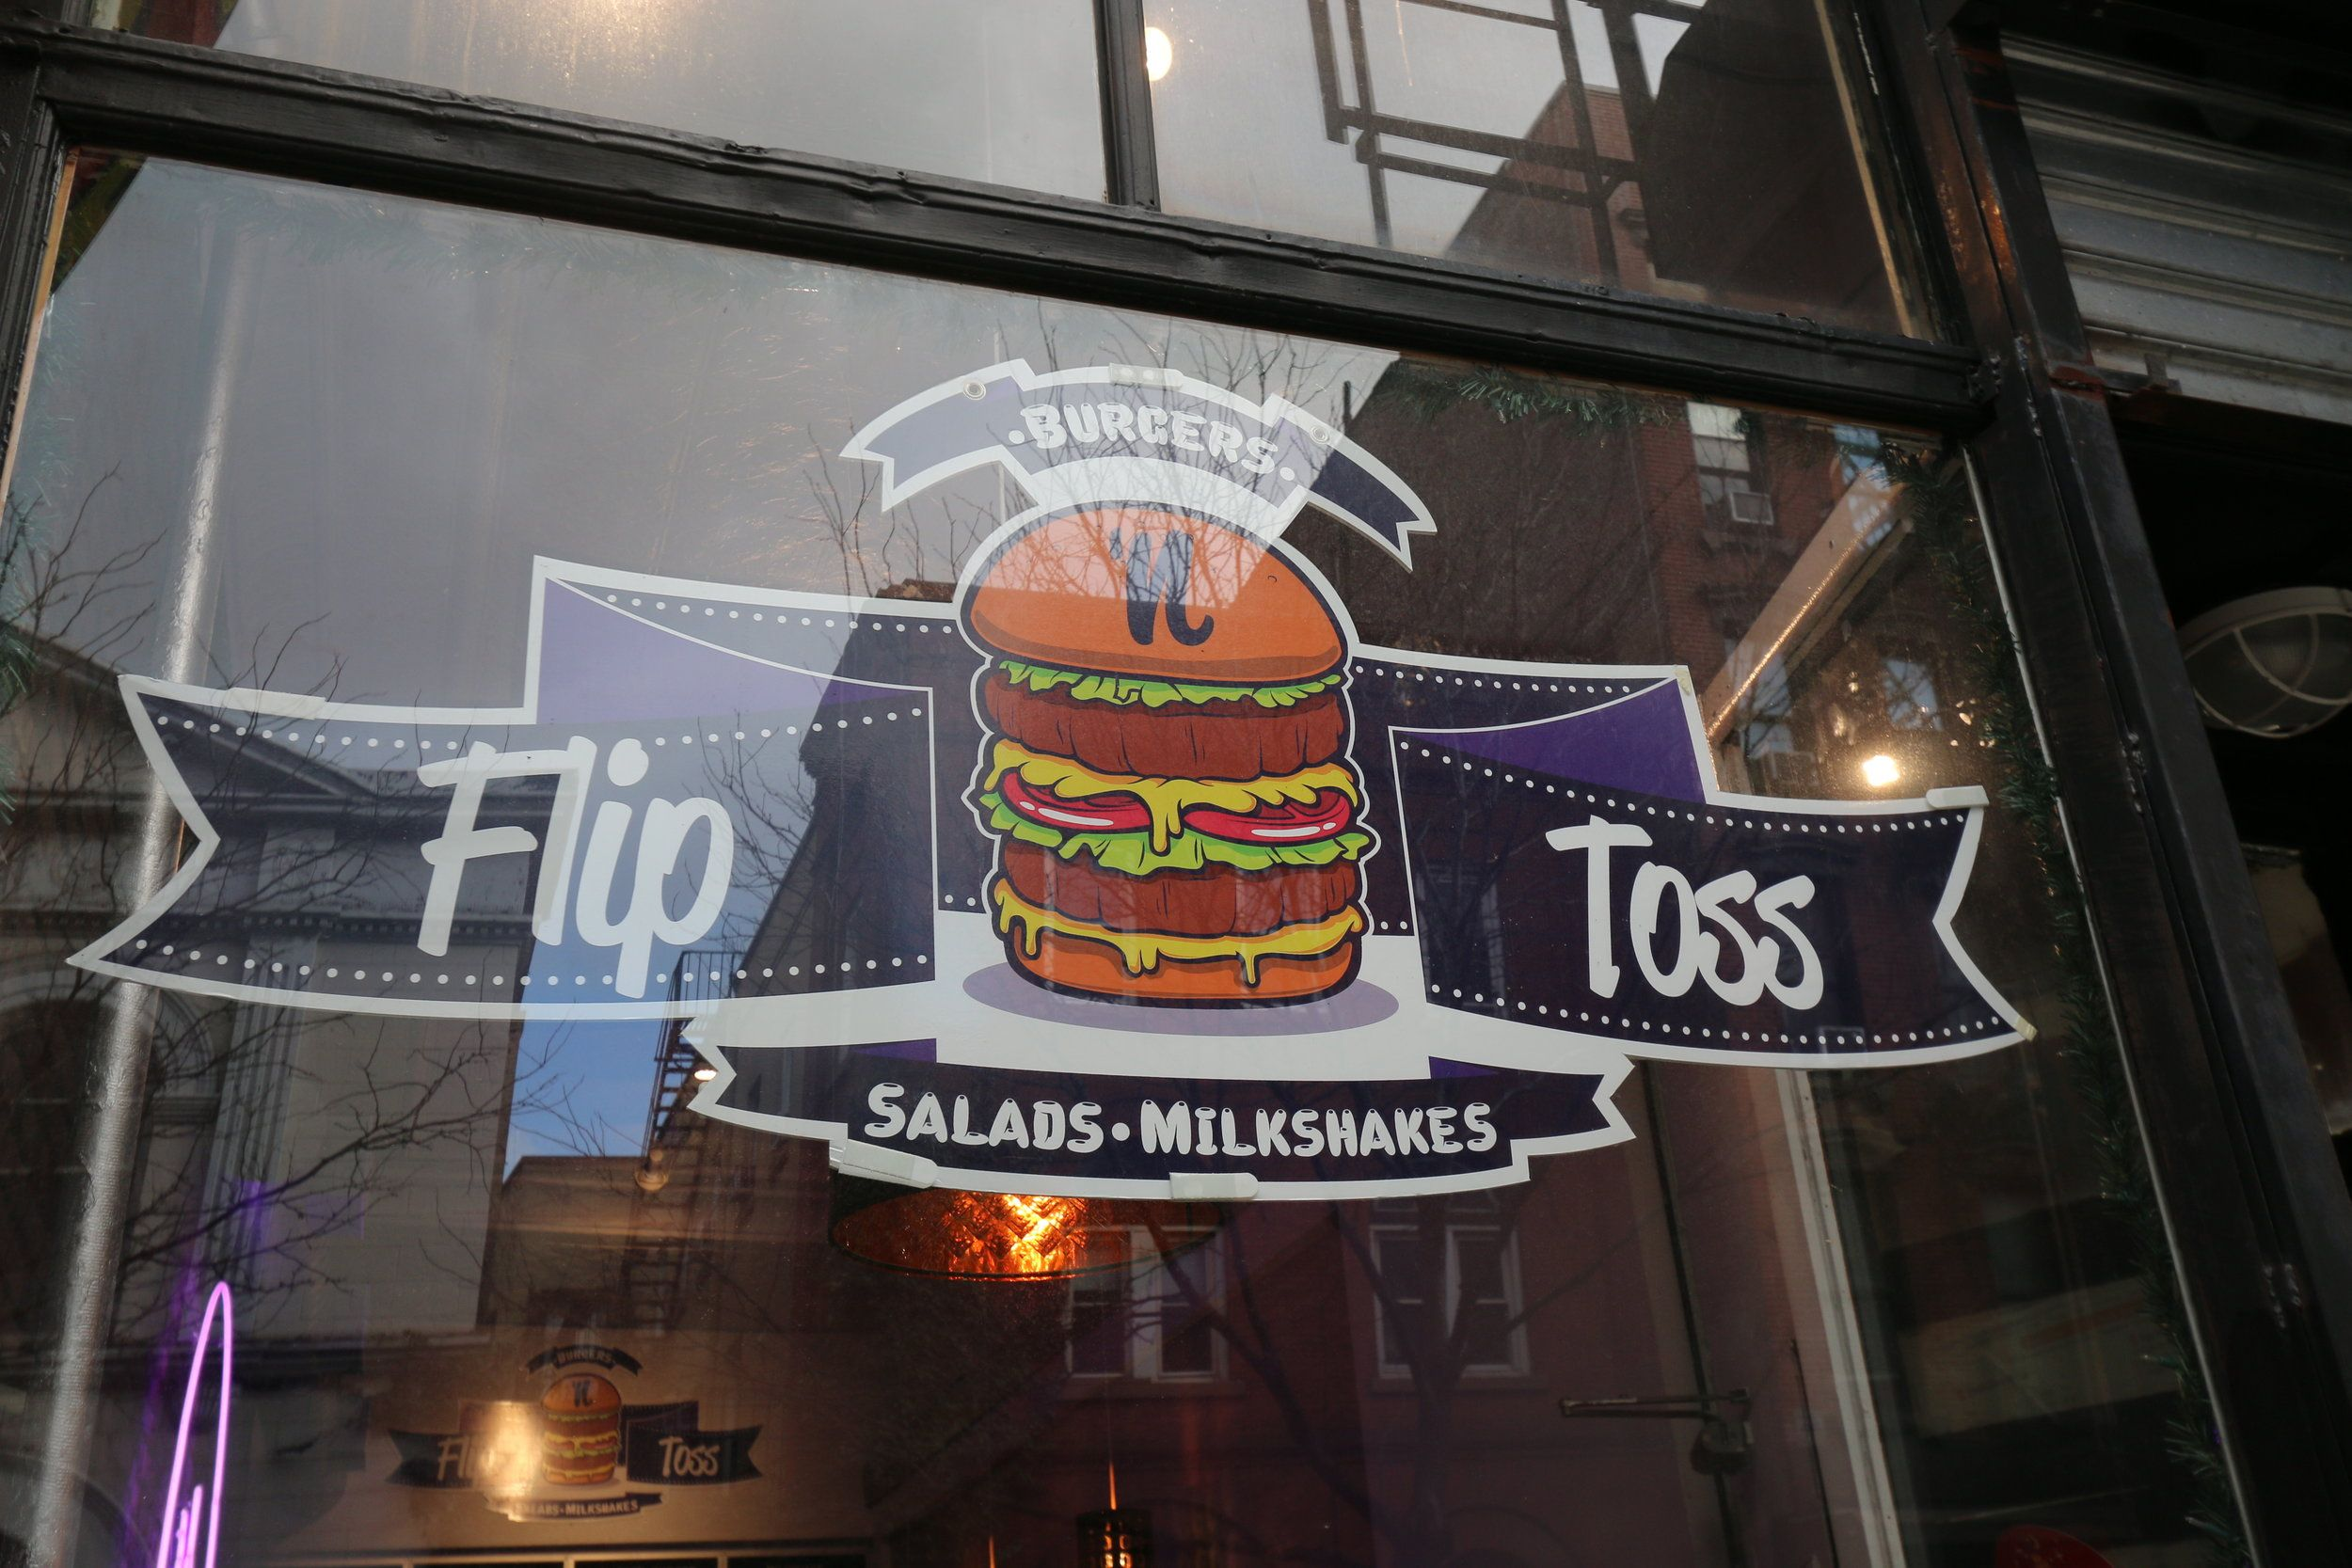 Flip n toss nyc new york food tossed salad lets run